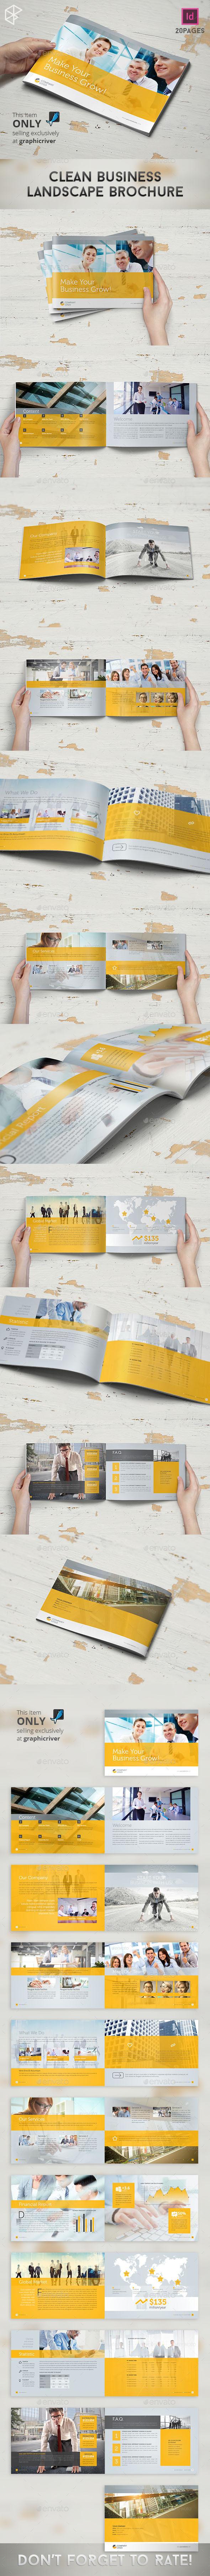 Clean Business Landscape Brochure - Corporate Brochures